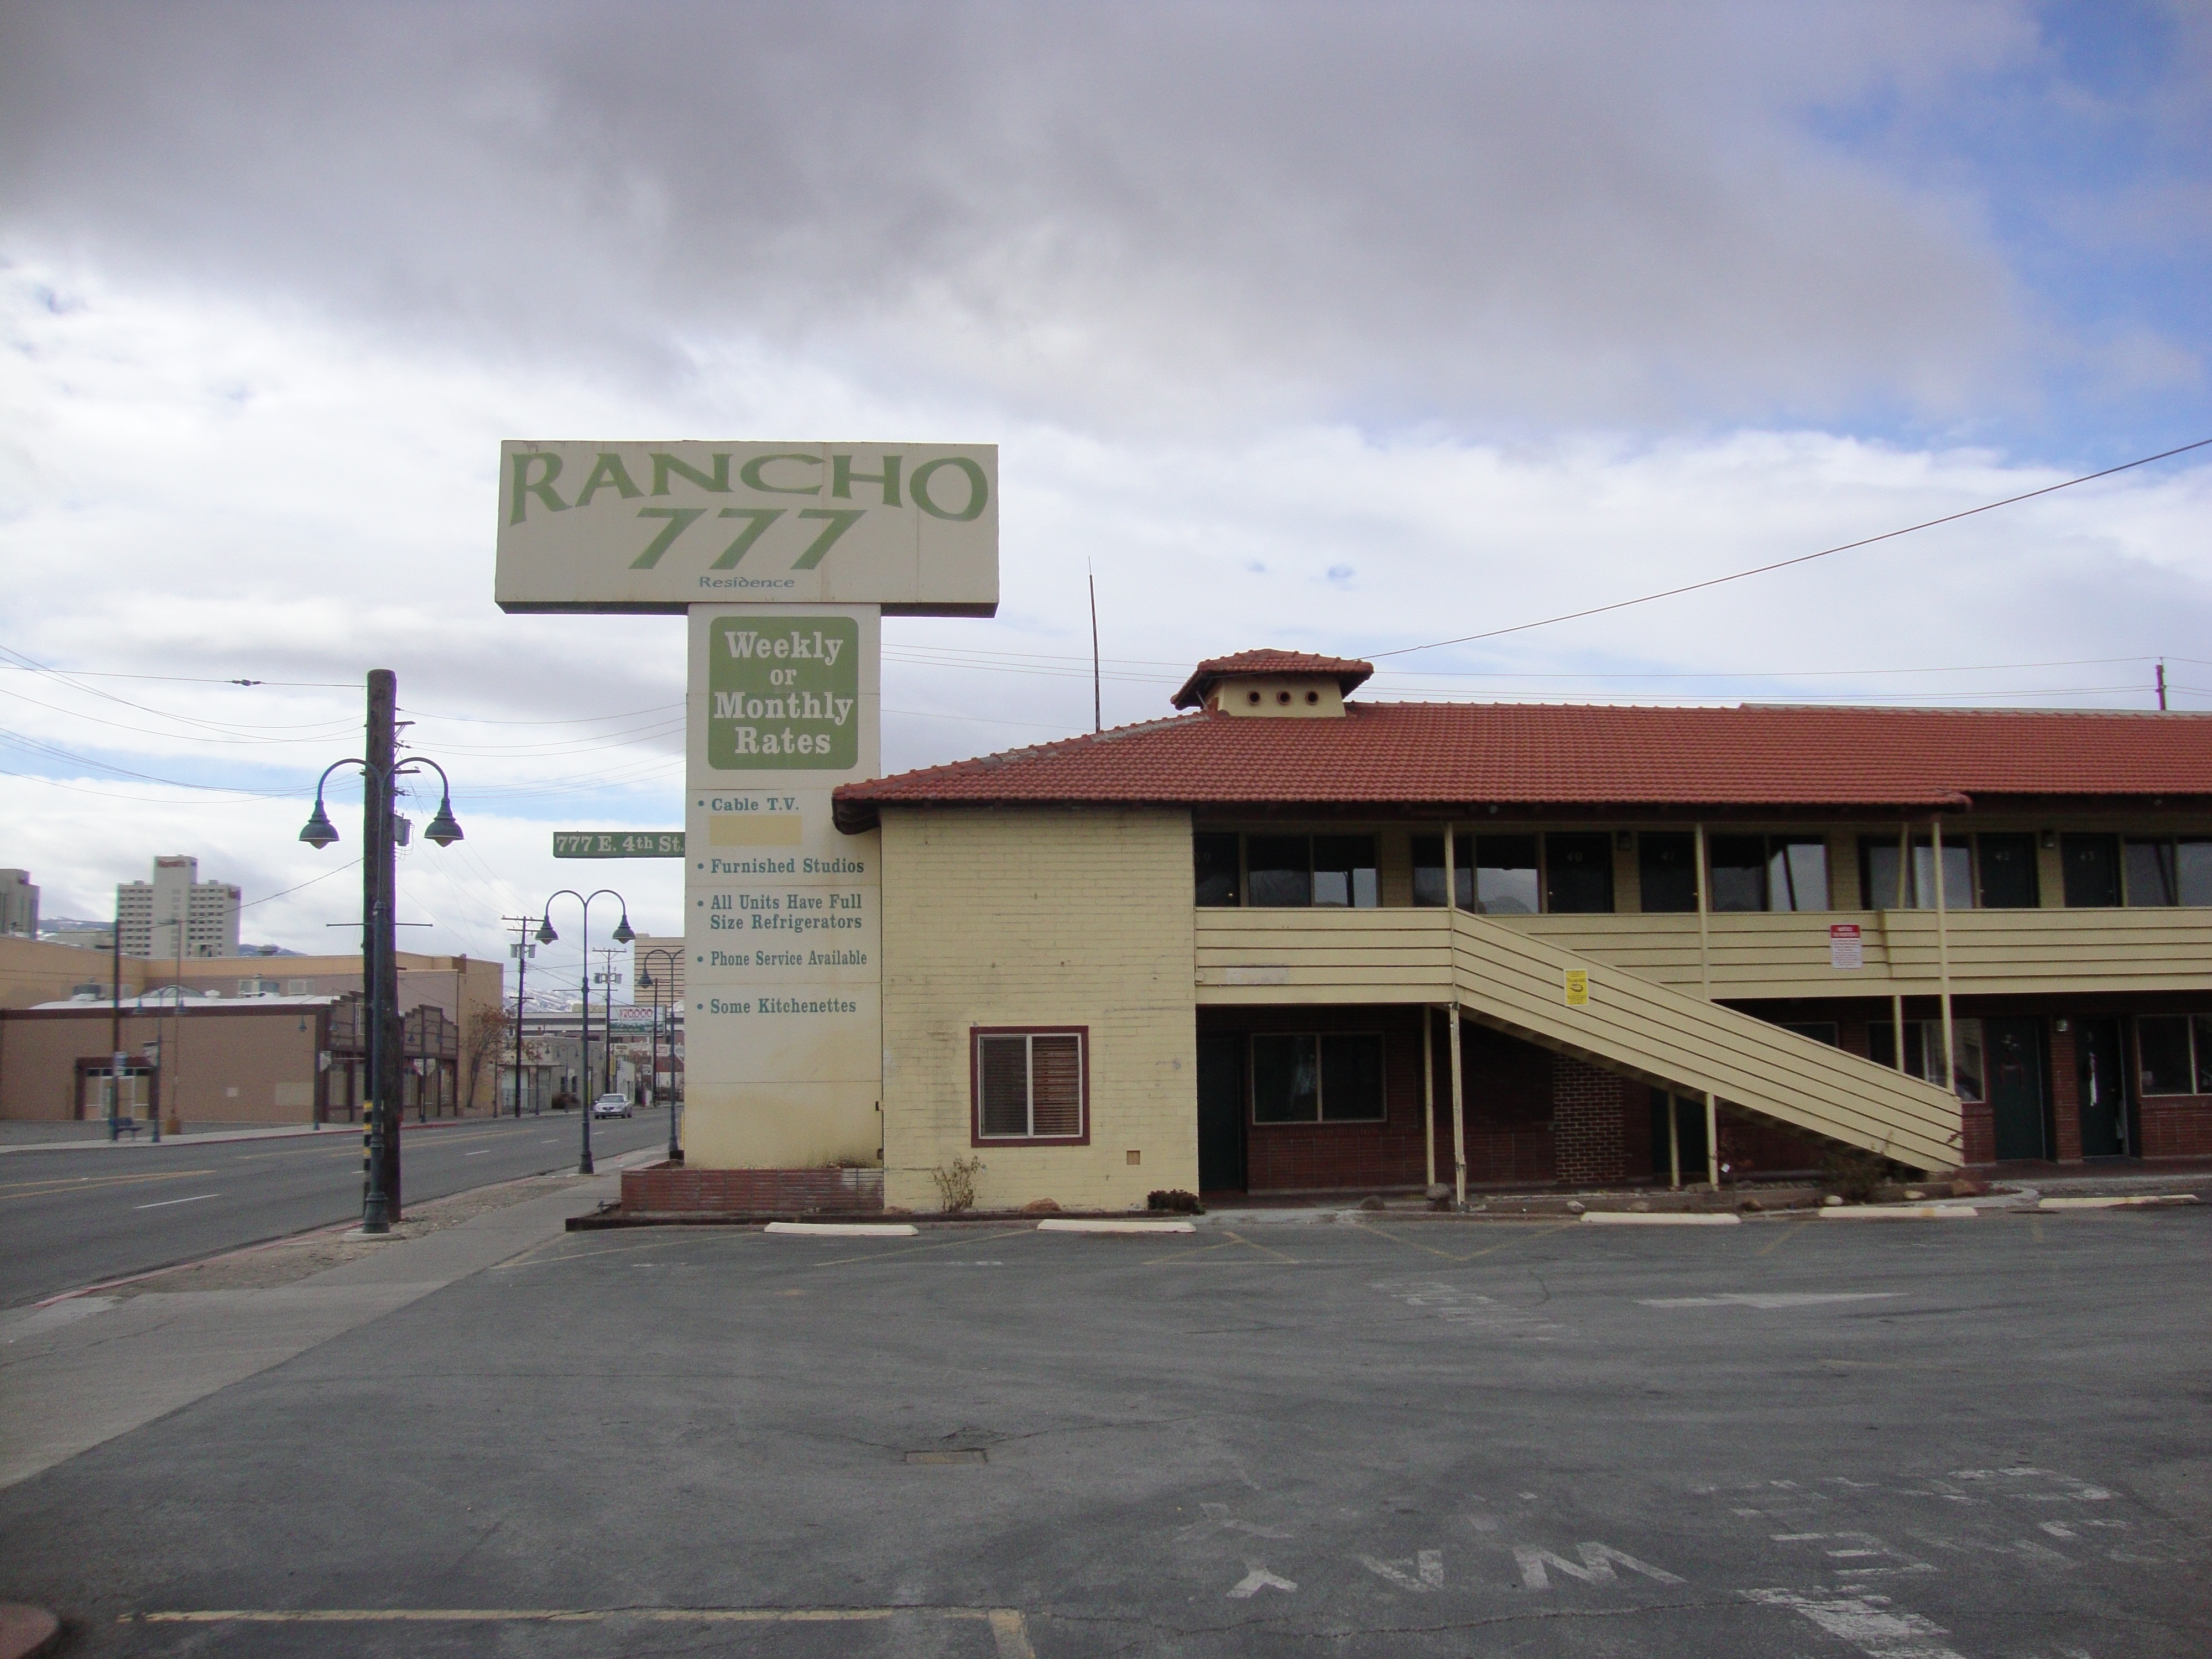 Rancho 777 777 E 4th St Reno Nv 89512 Ypcom